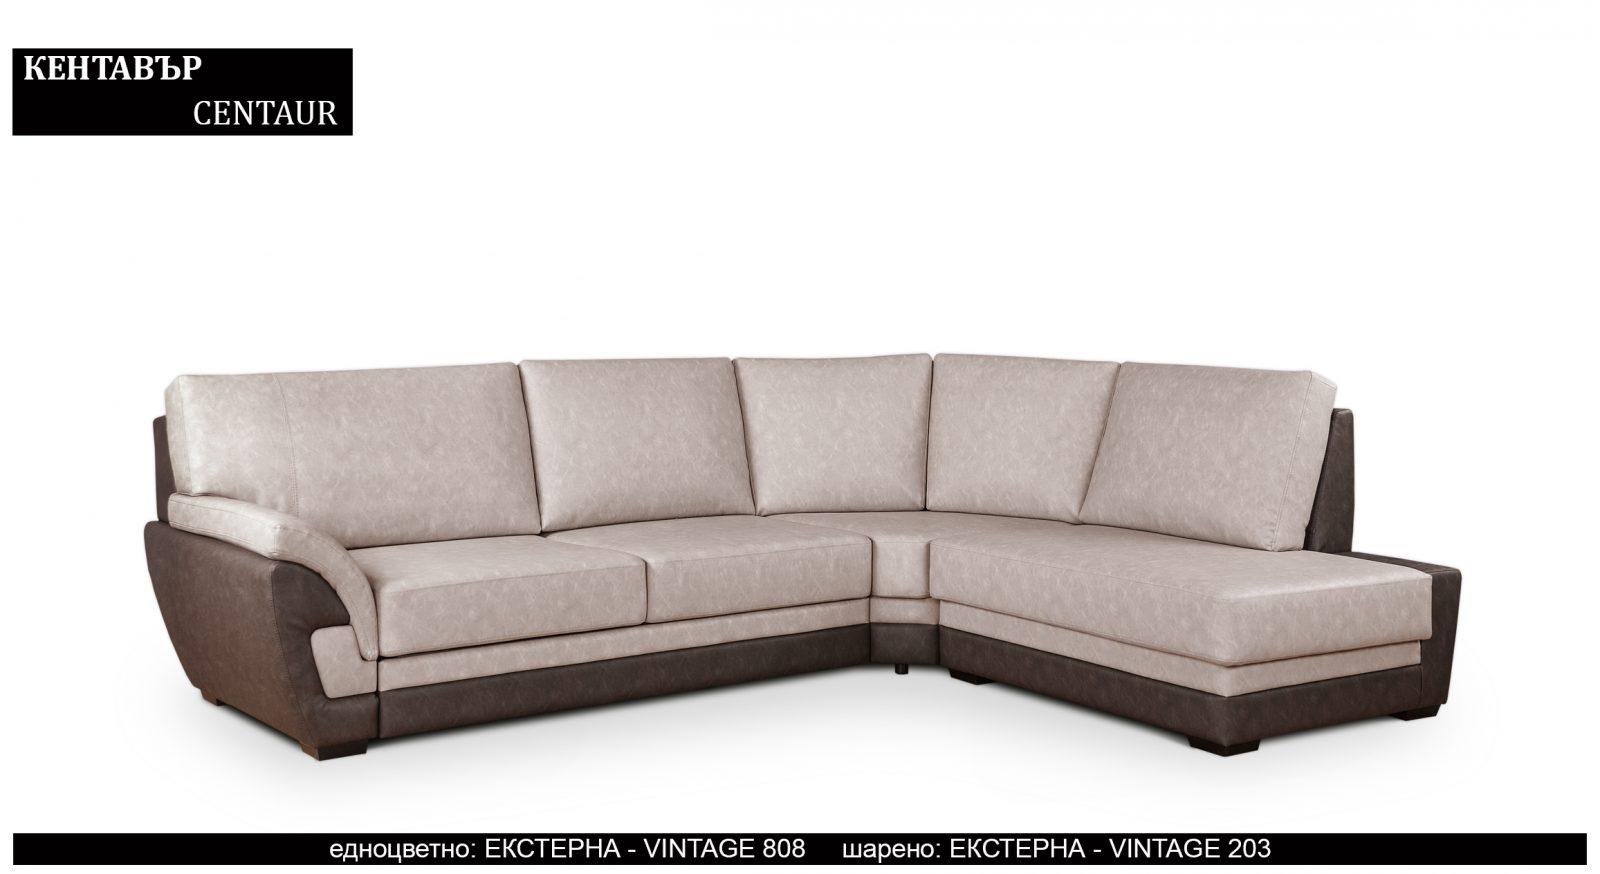 "(Български) Ъглов диван ""КЕНТАВЪР""  Луксозни  ъглови  дивани"